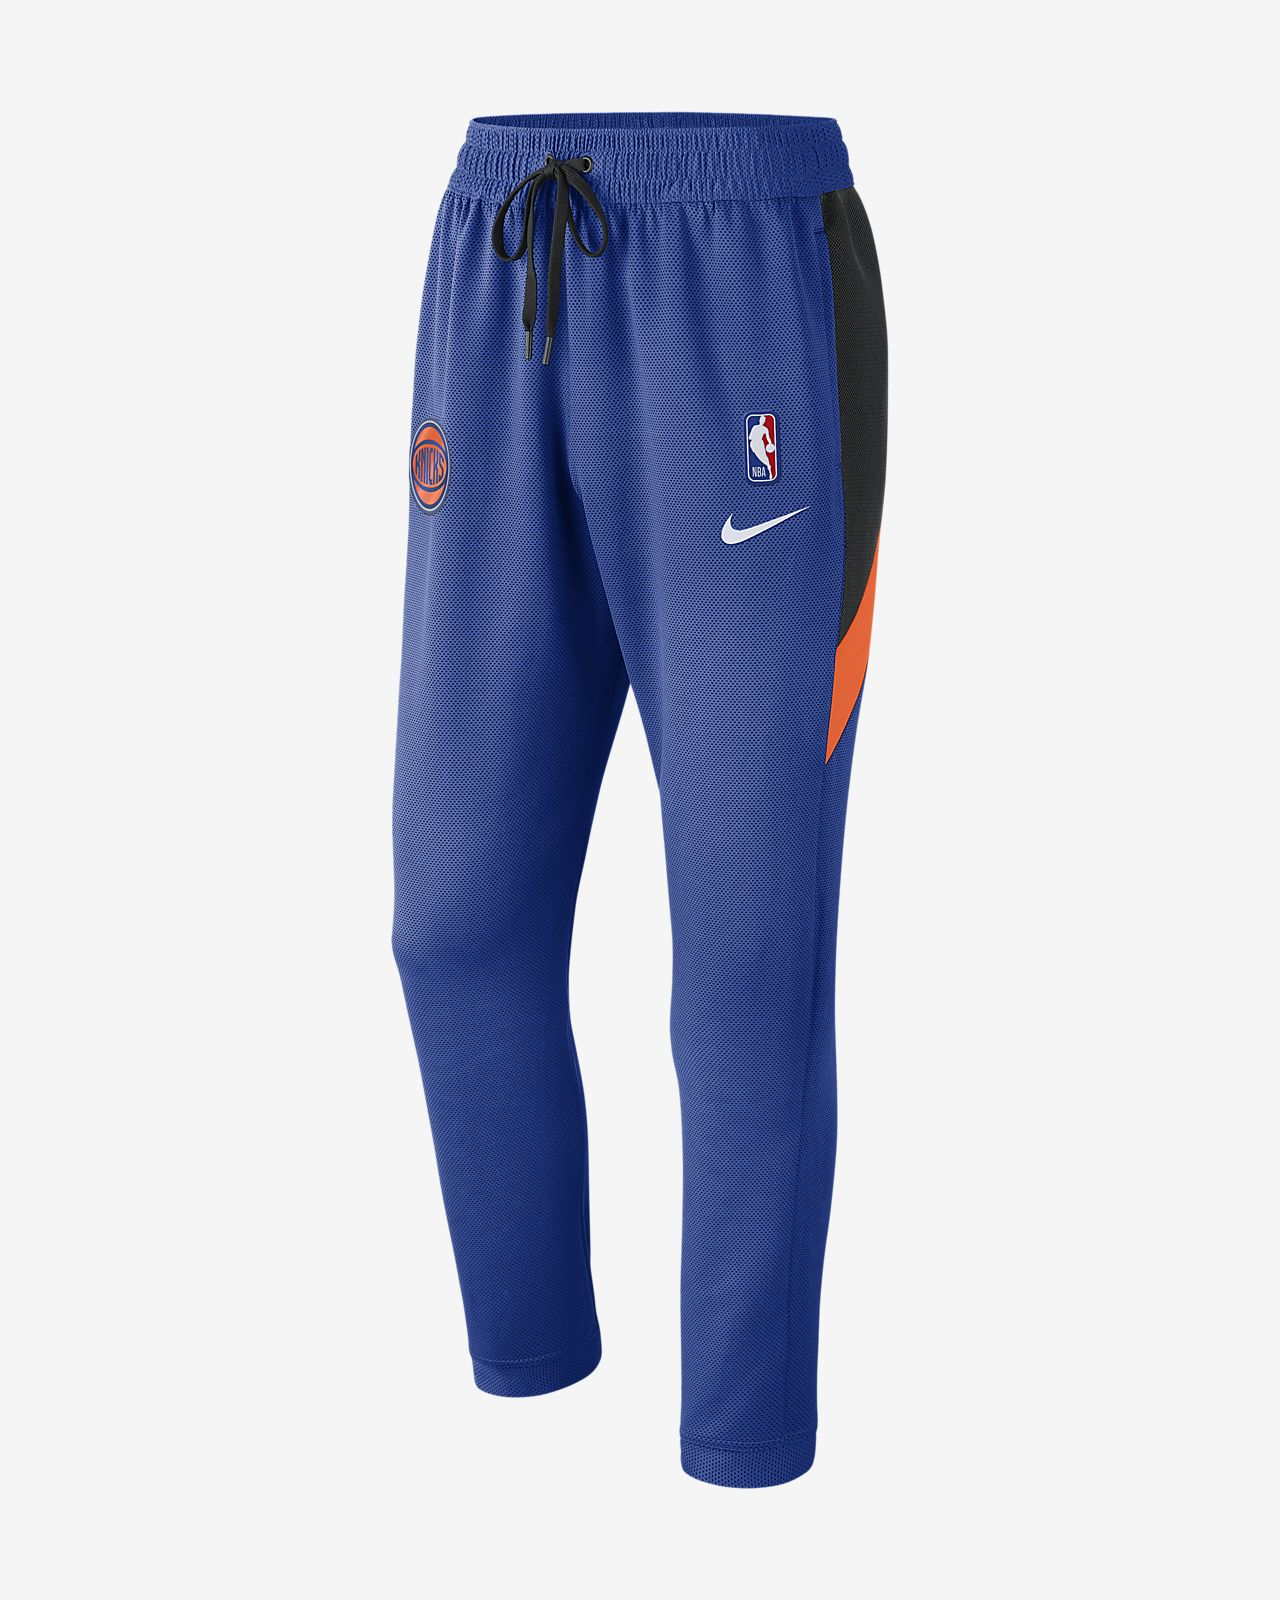 New York Knicks Nike Therma Flex Showtime NBA-s férfinadrág